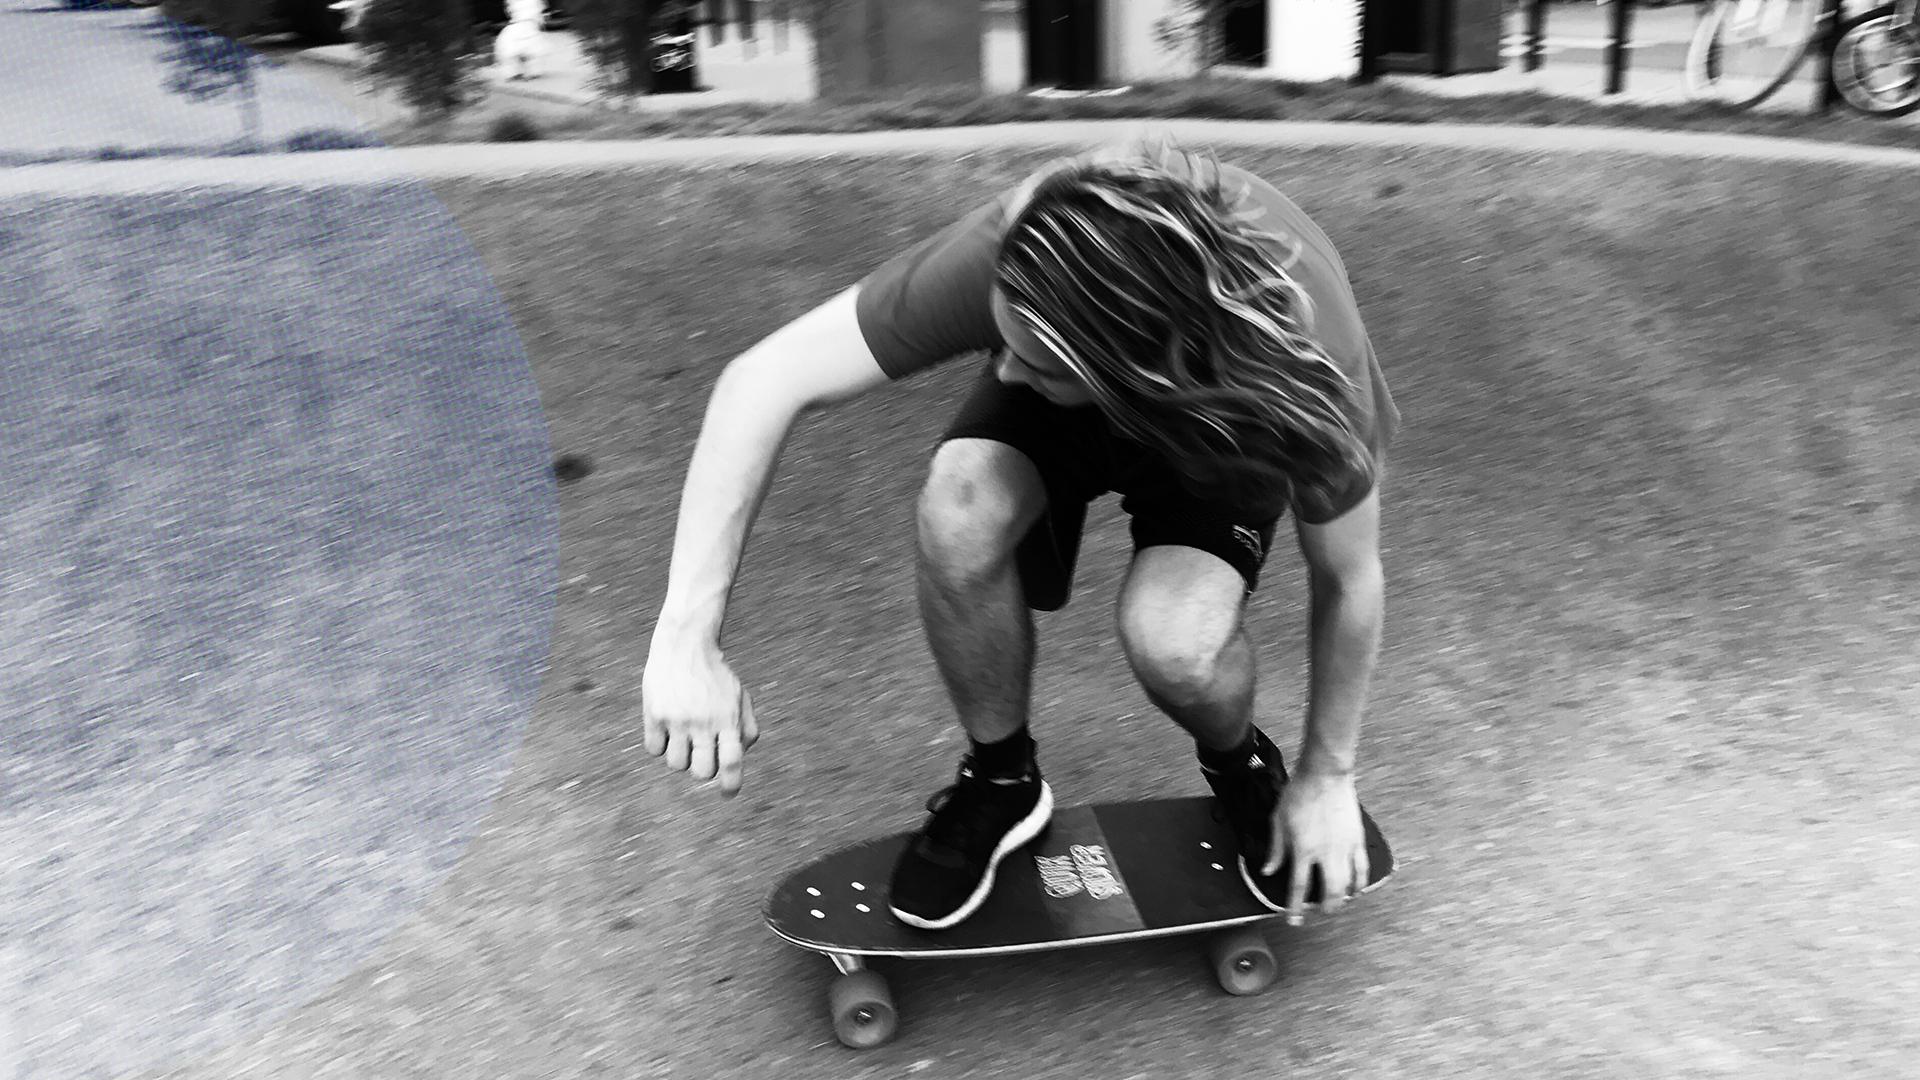 Thumb Skate